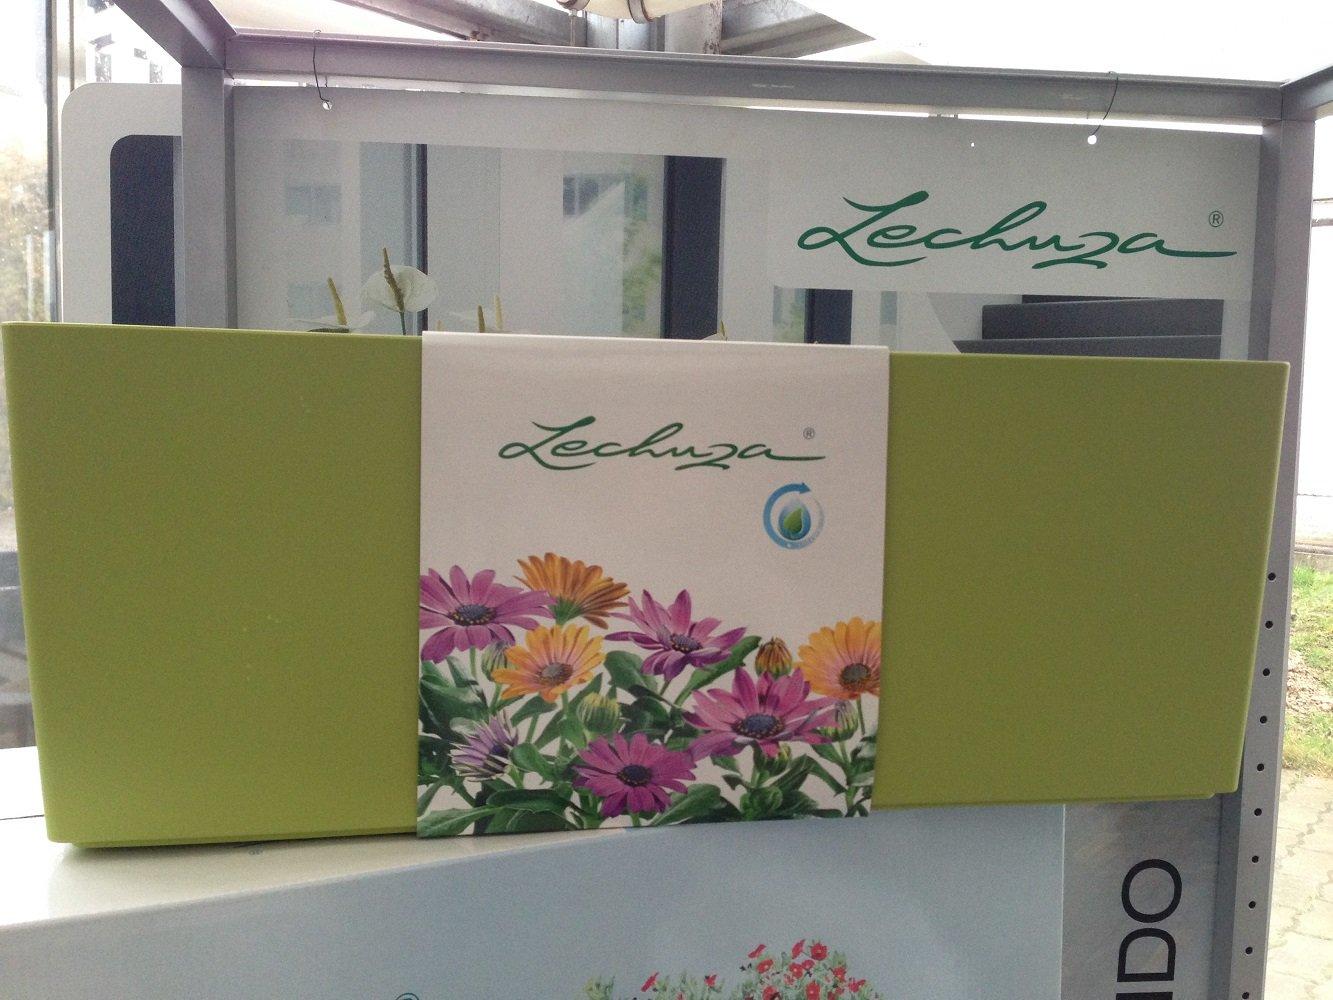 4 x Lechuza Balconera 50 Color Pistaziengrün Komplettset Balkonkasten Blumenkasten